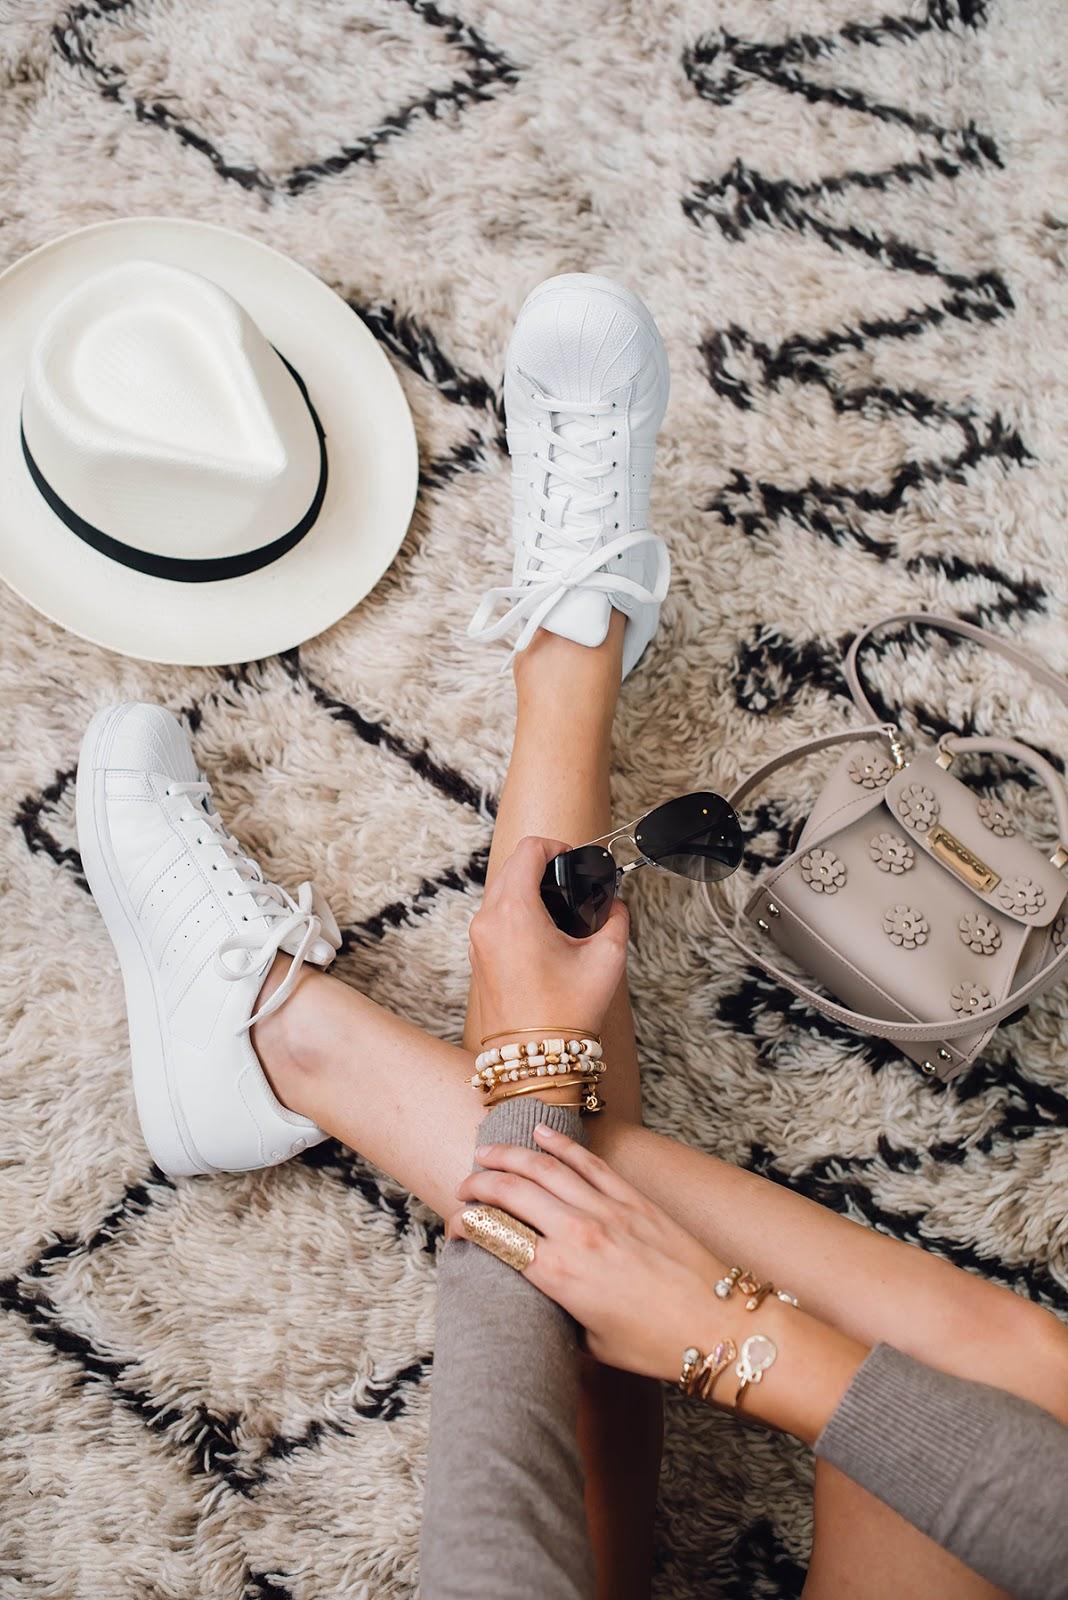 Favorite 2016 Trends Still Happening | Adidas Superstar Sneakers | Trends to wear in 2017